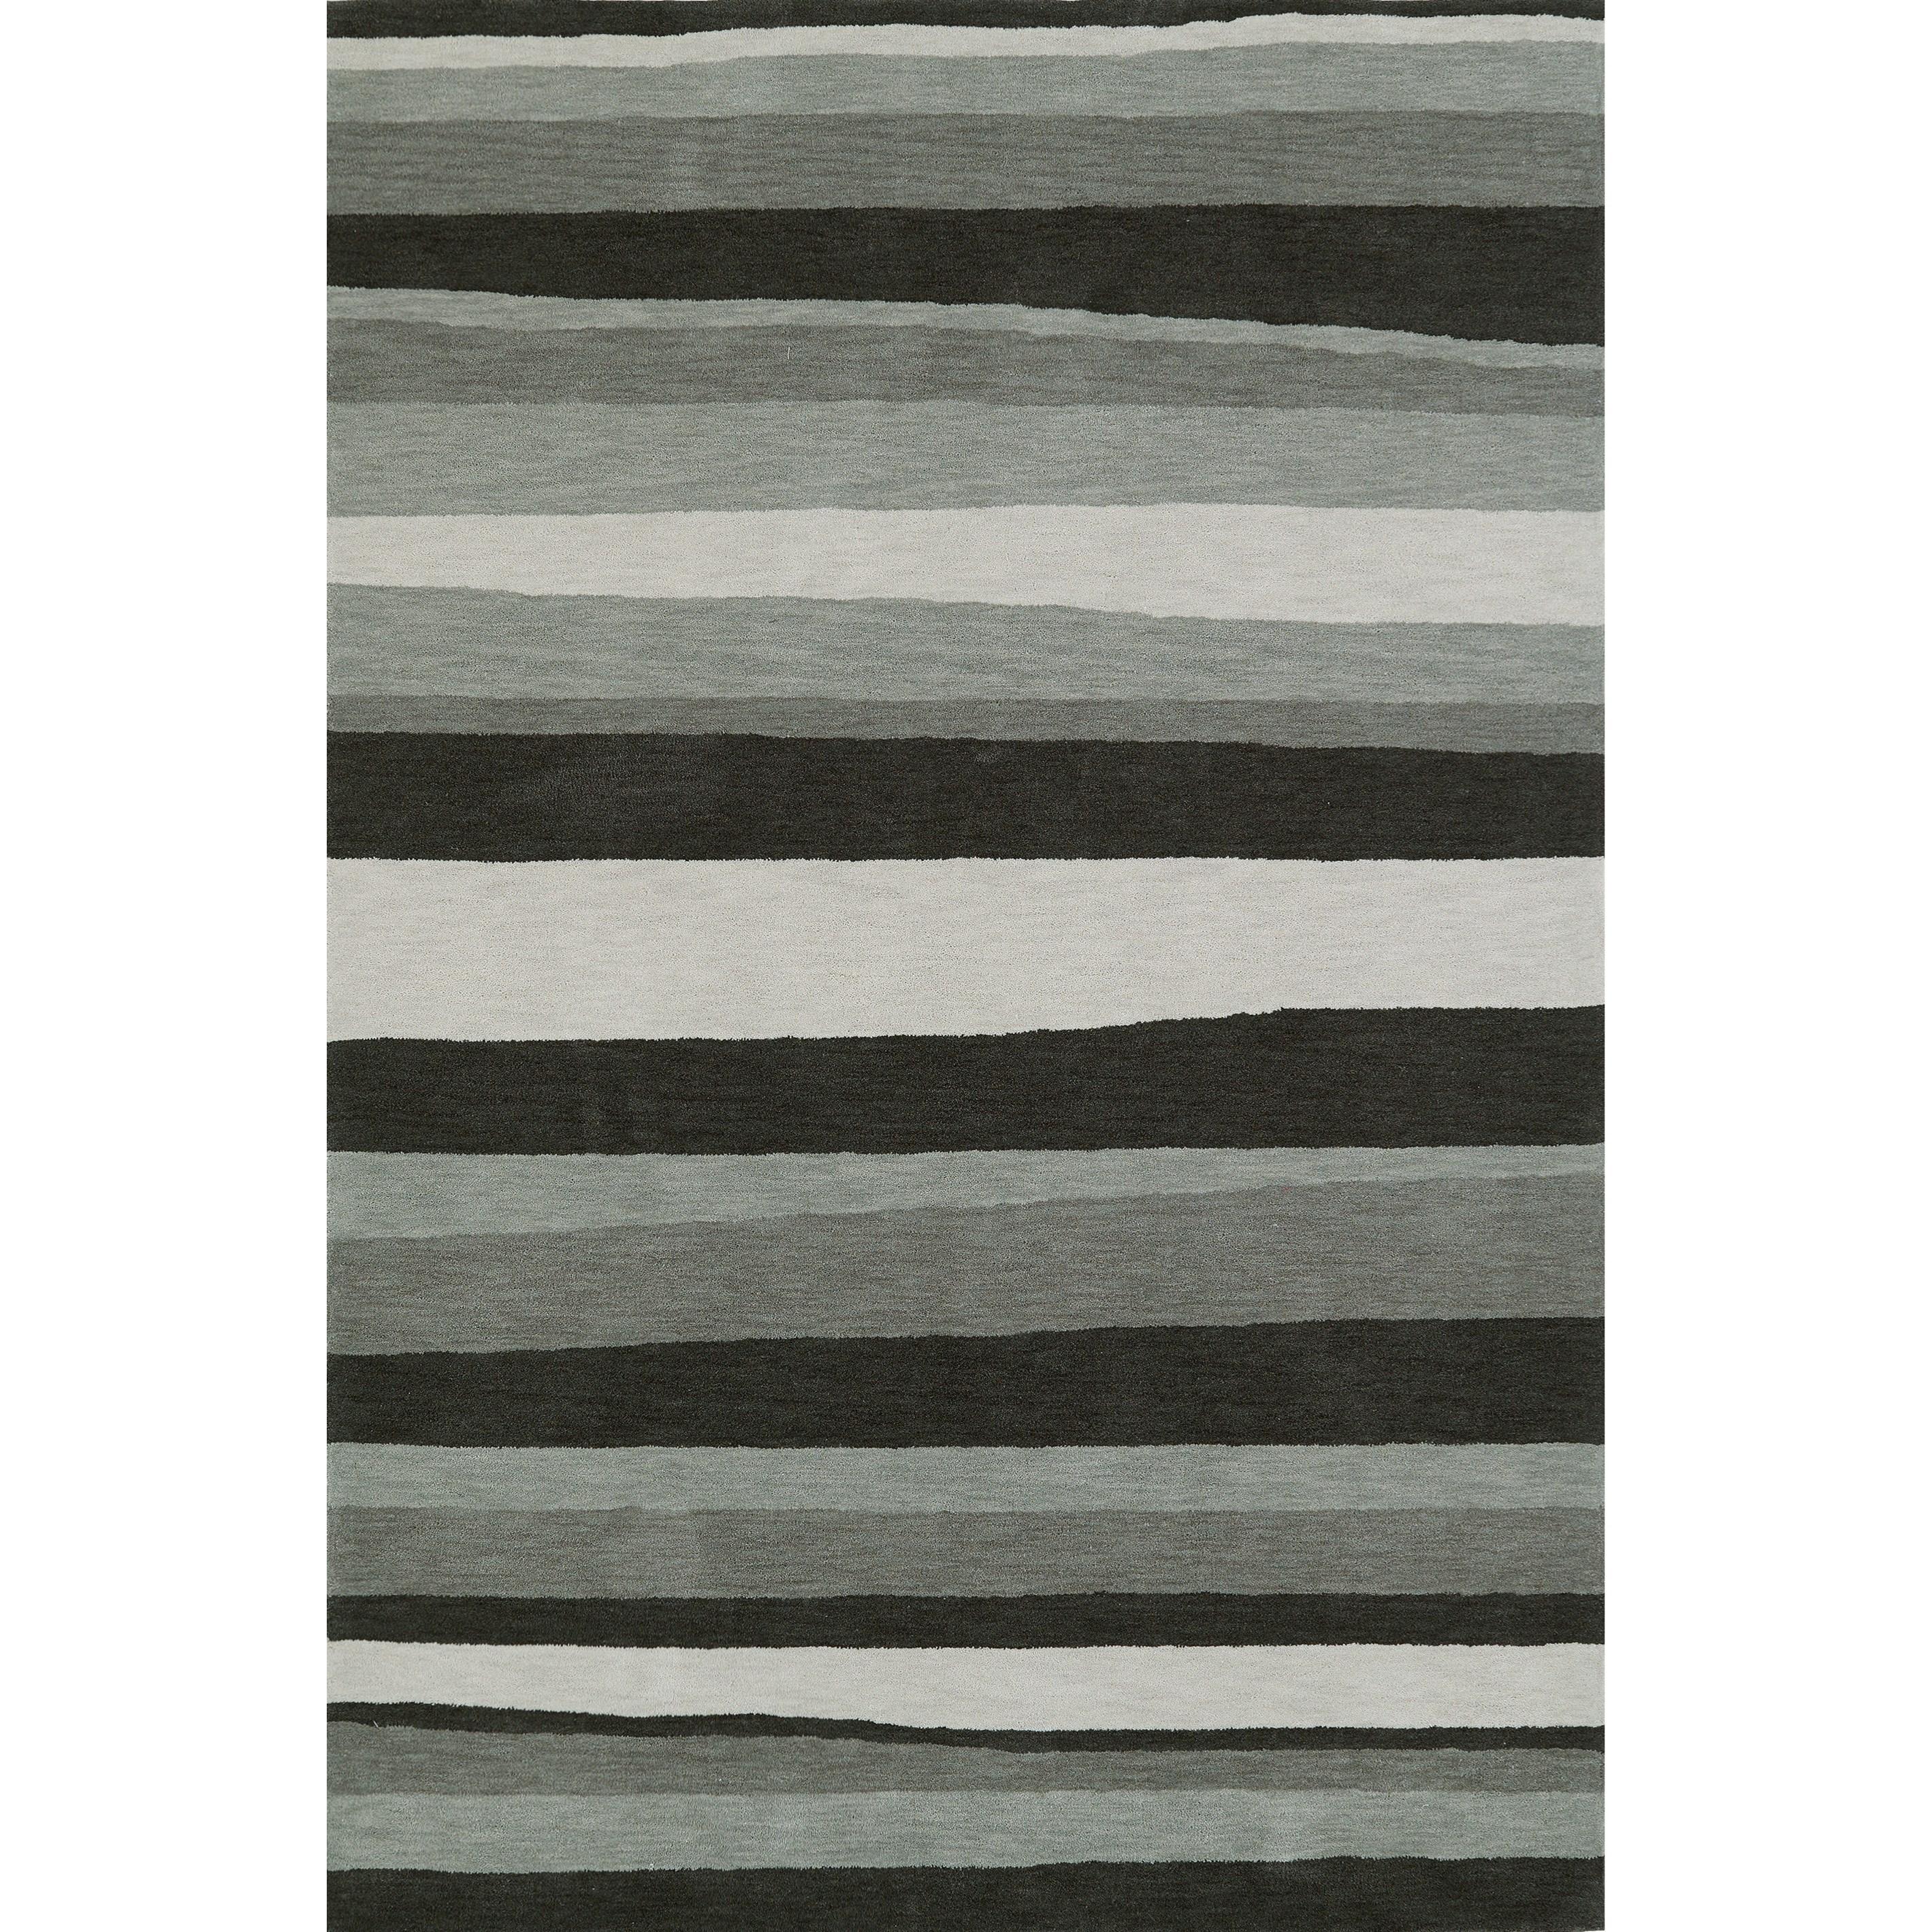 Dalyn Aloft Charcoal 9'X13' Rug - Item Number: AL8CH9X13